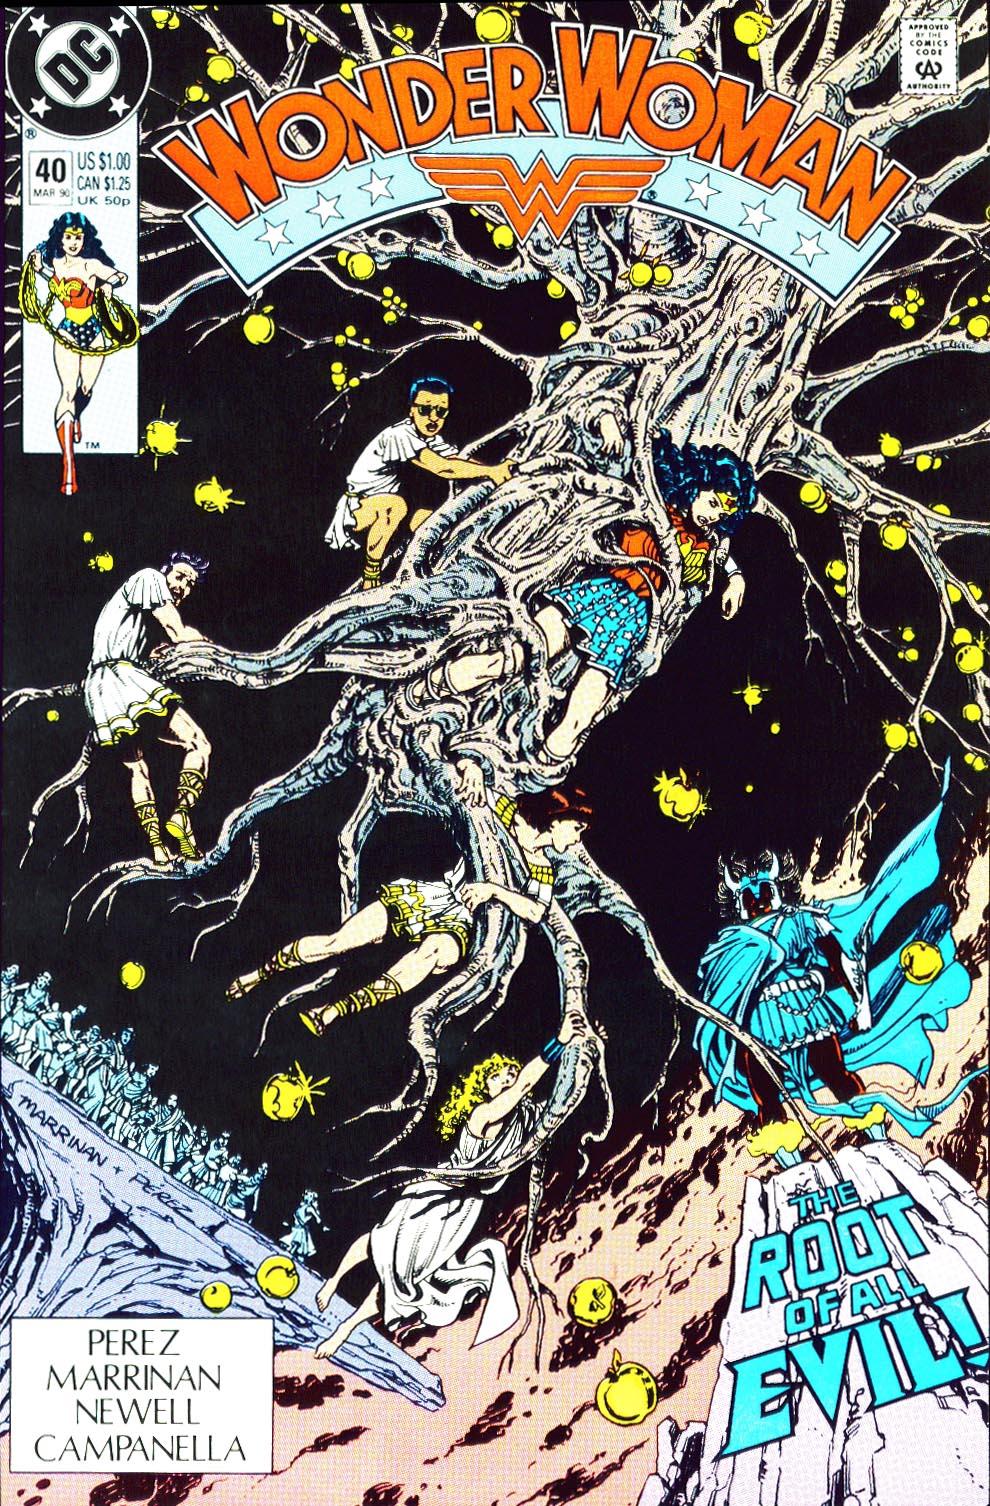 Read online Wonder Woman (1987) comic -  Issue #40 - 2